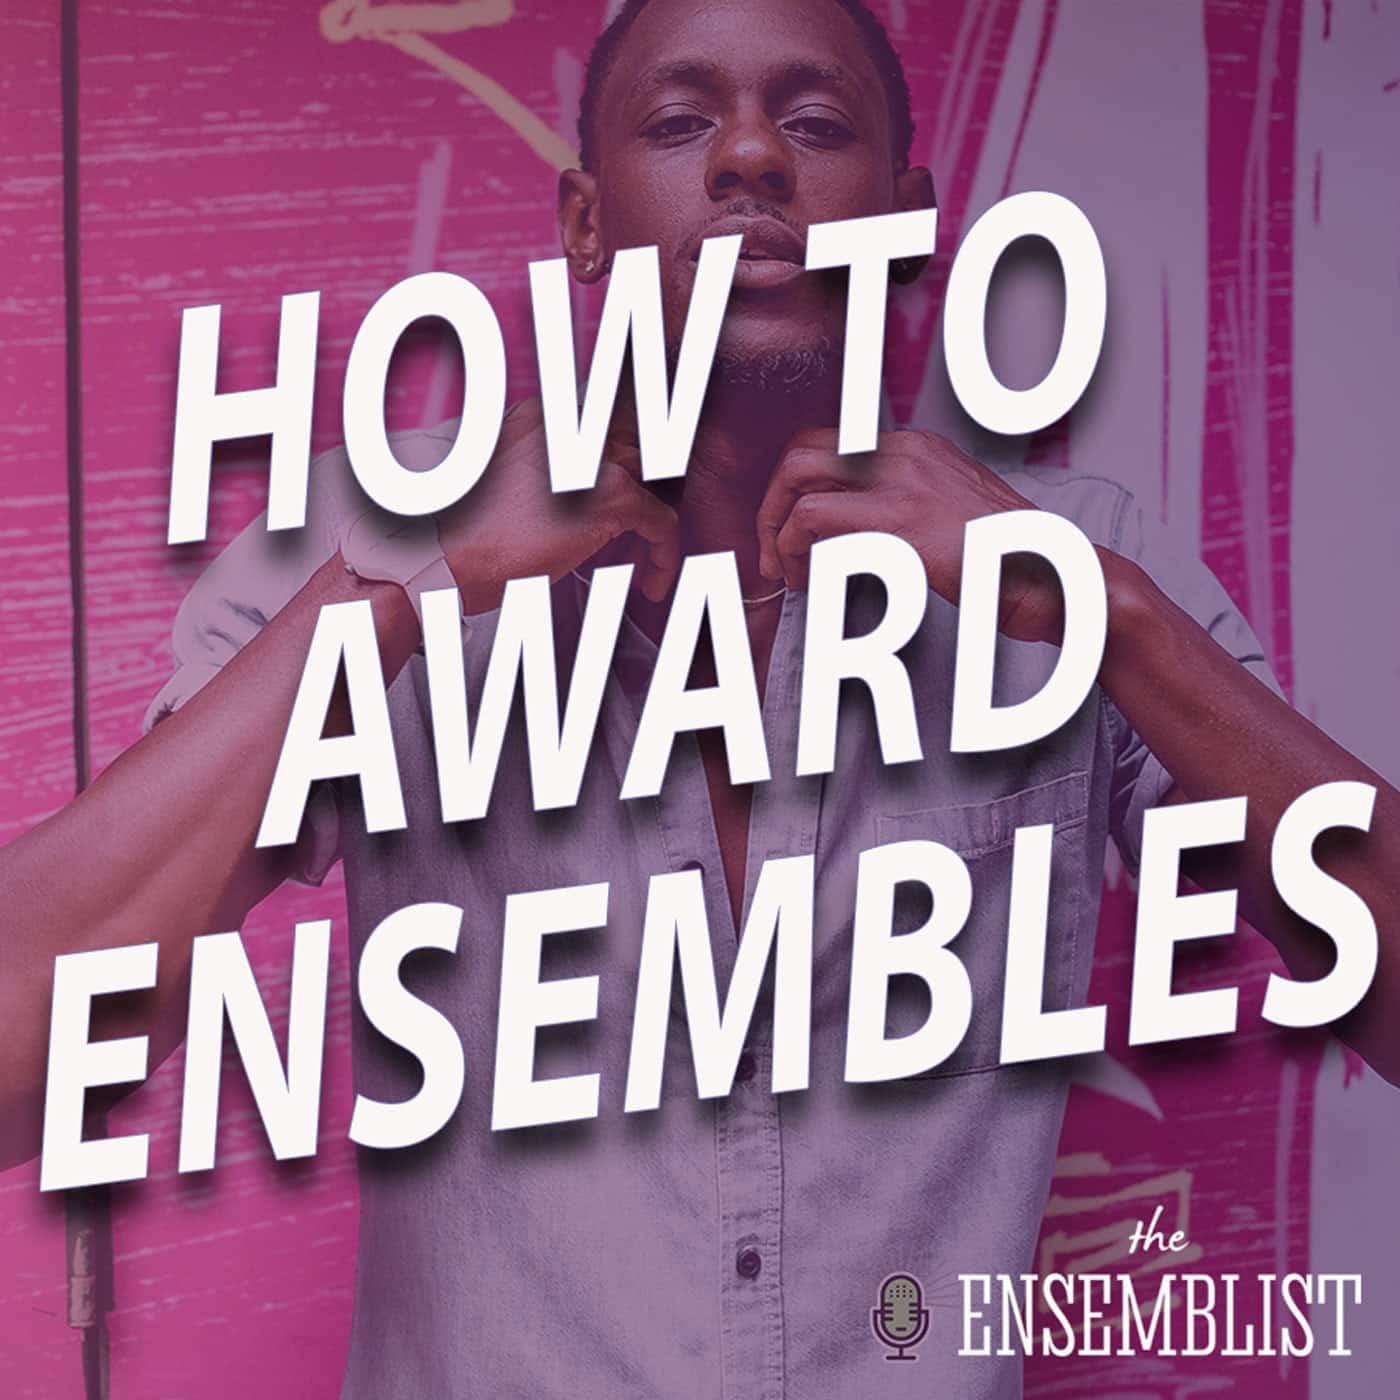 #508 - How to Award Ensembles (feat. Darius Barnes)